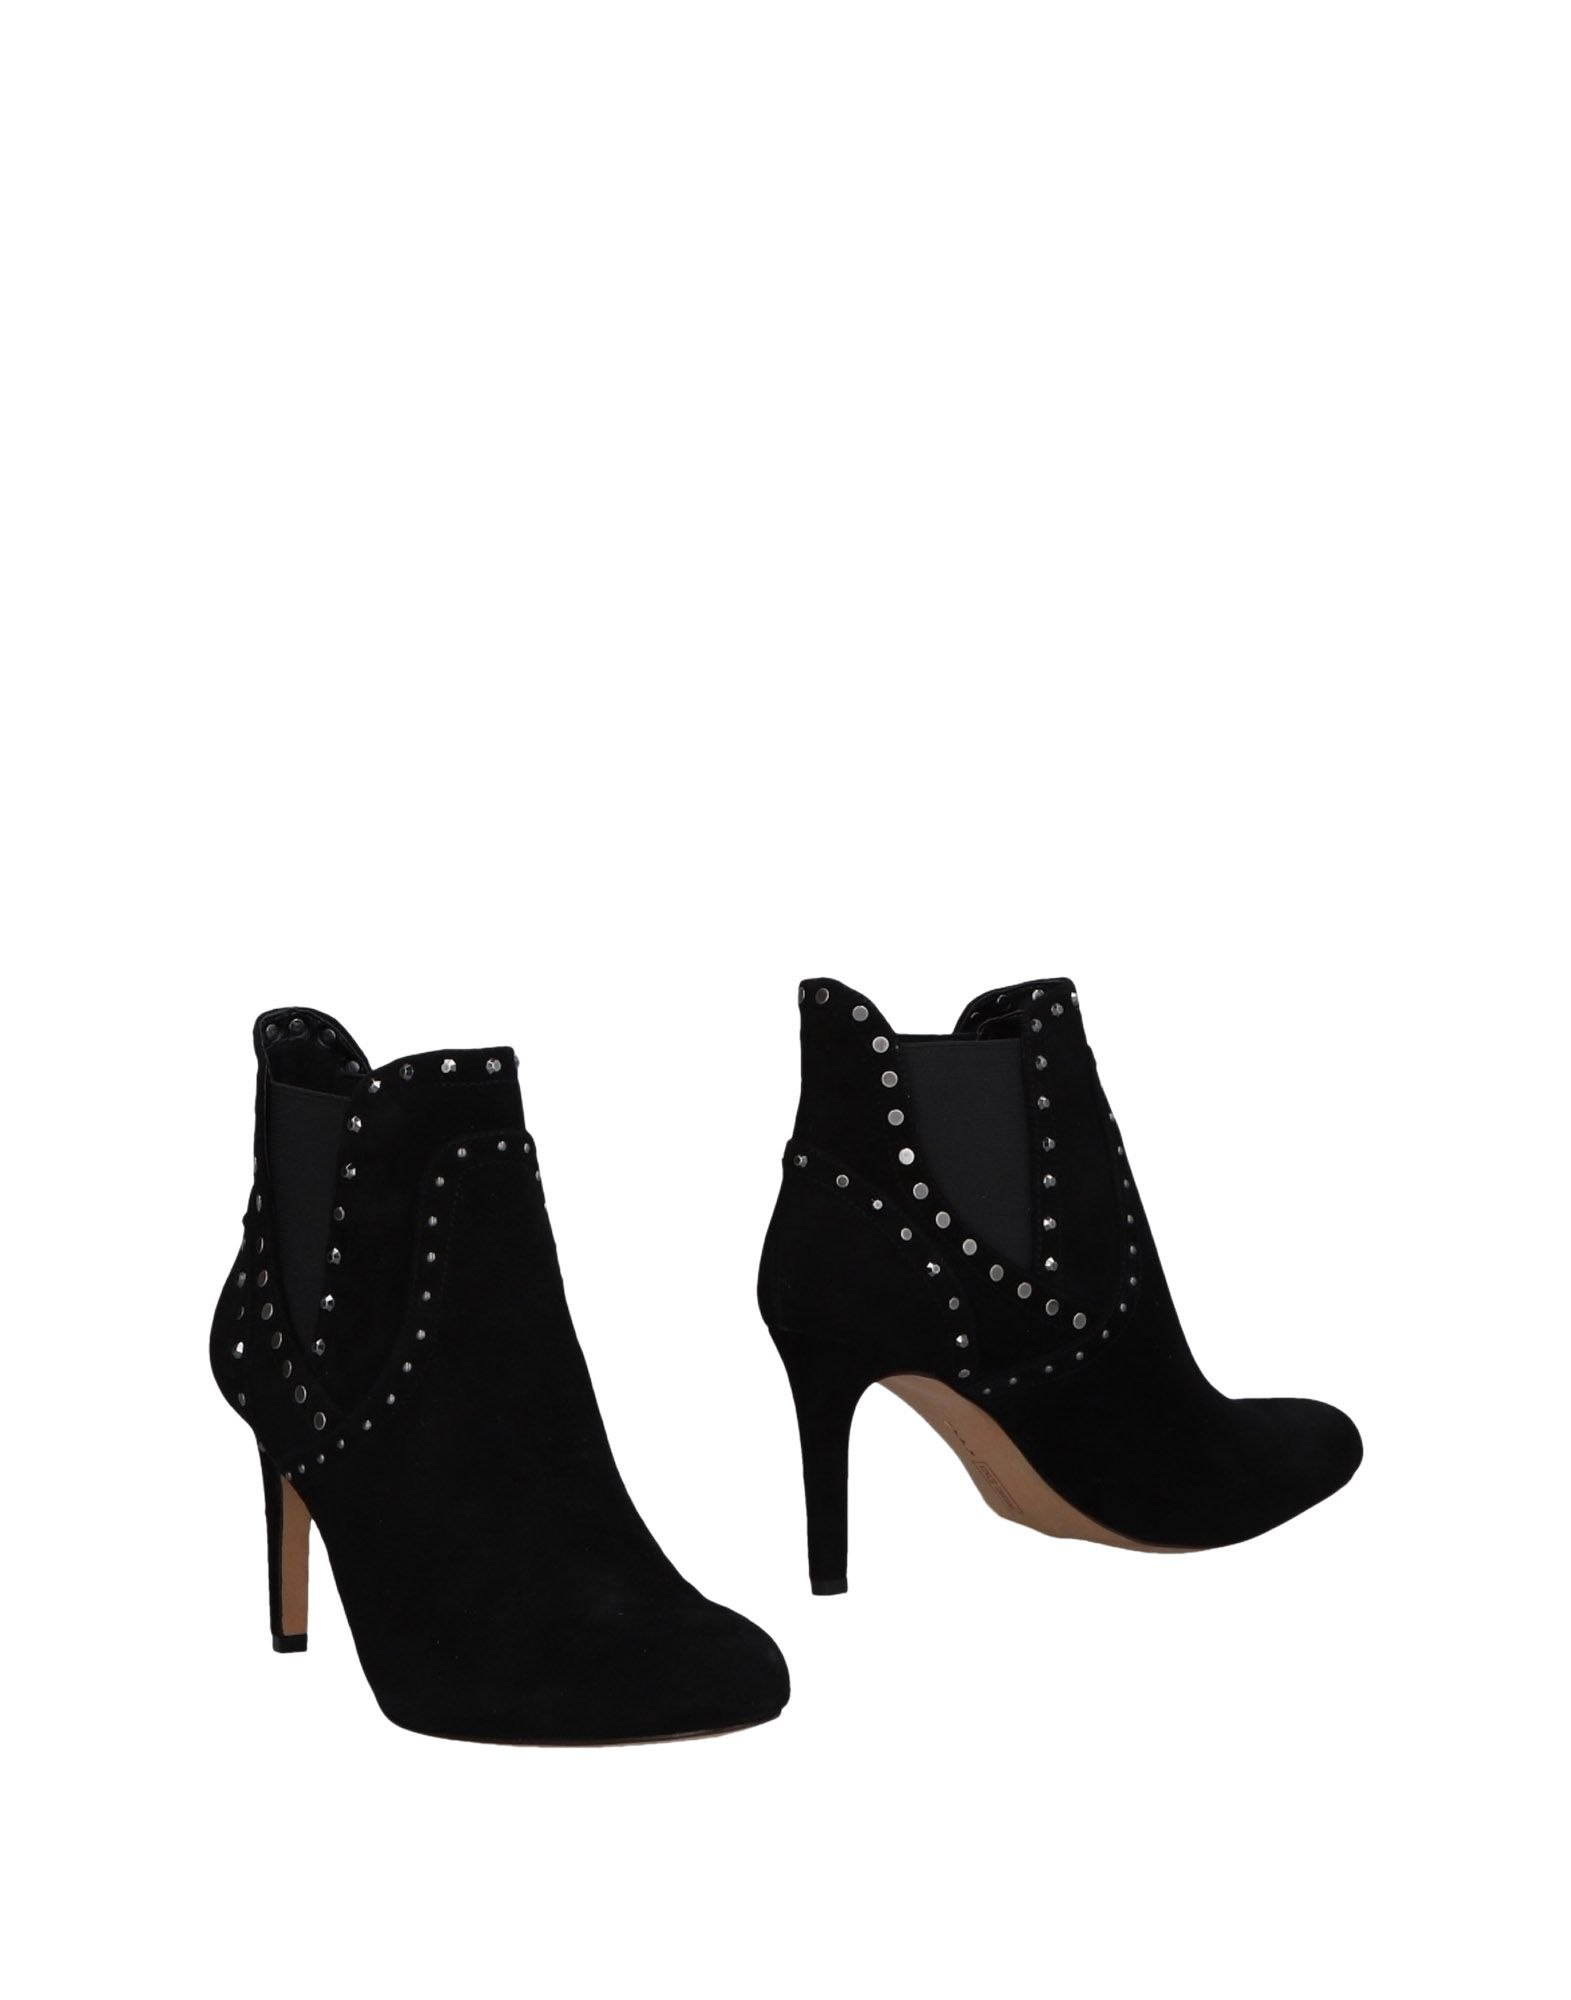 Vince Camuto Gute Chelsea Boots Damen  11480024JJ Gute Camuto Qualität beliebte Schuhe f77bea